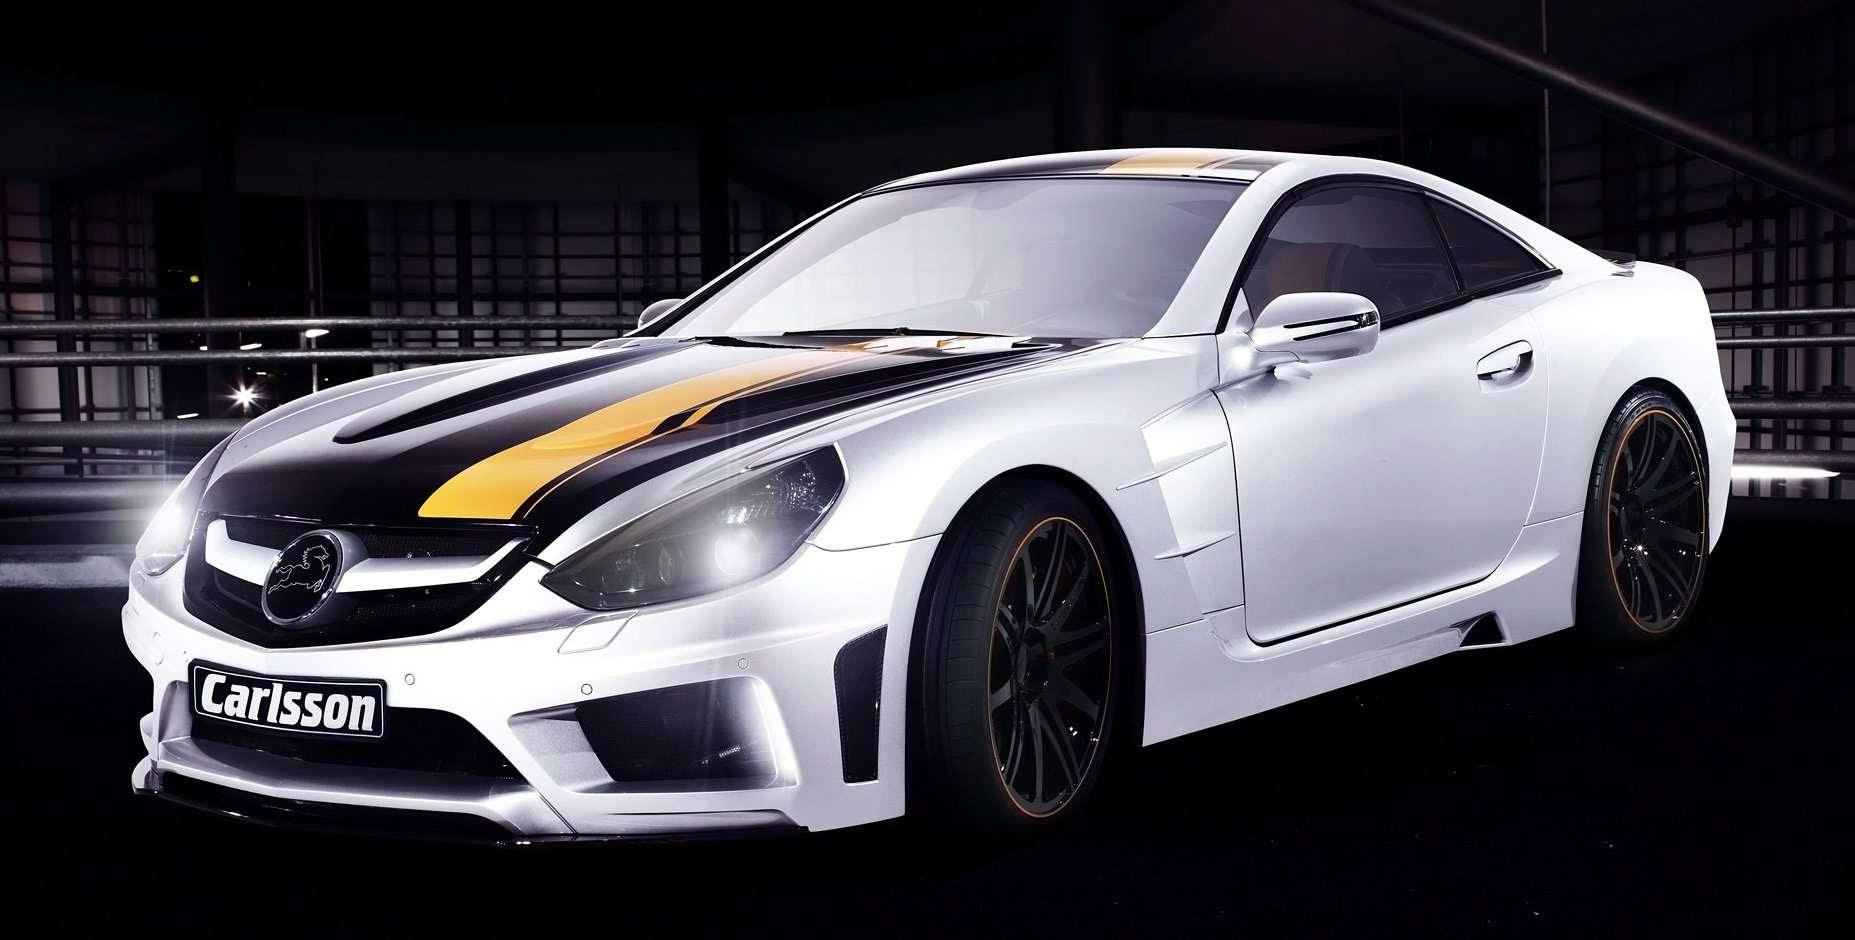 POWER CARS: Mercedes-Benz SL Carlsson Super GT C25